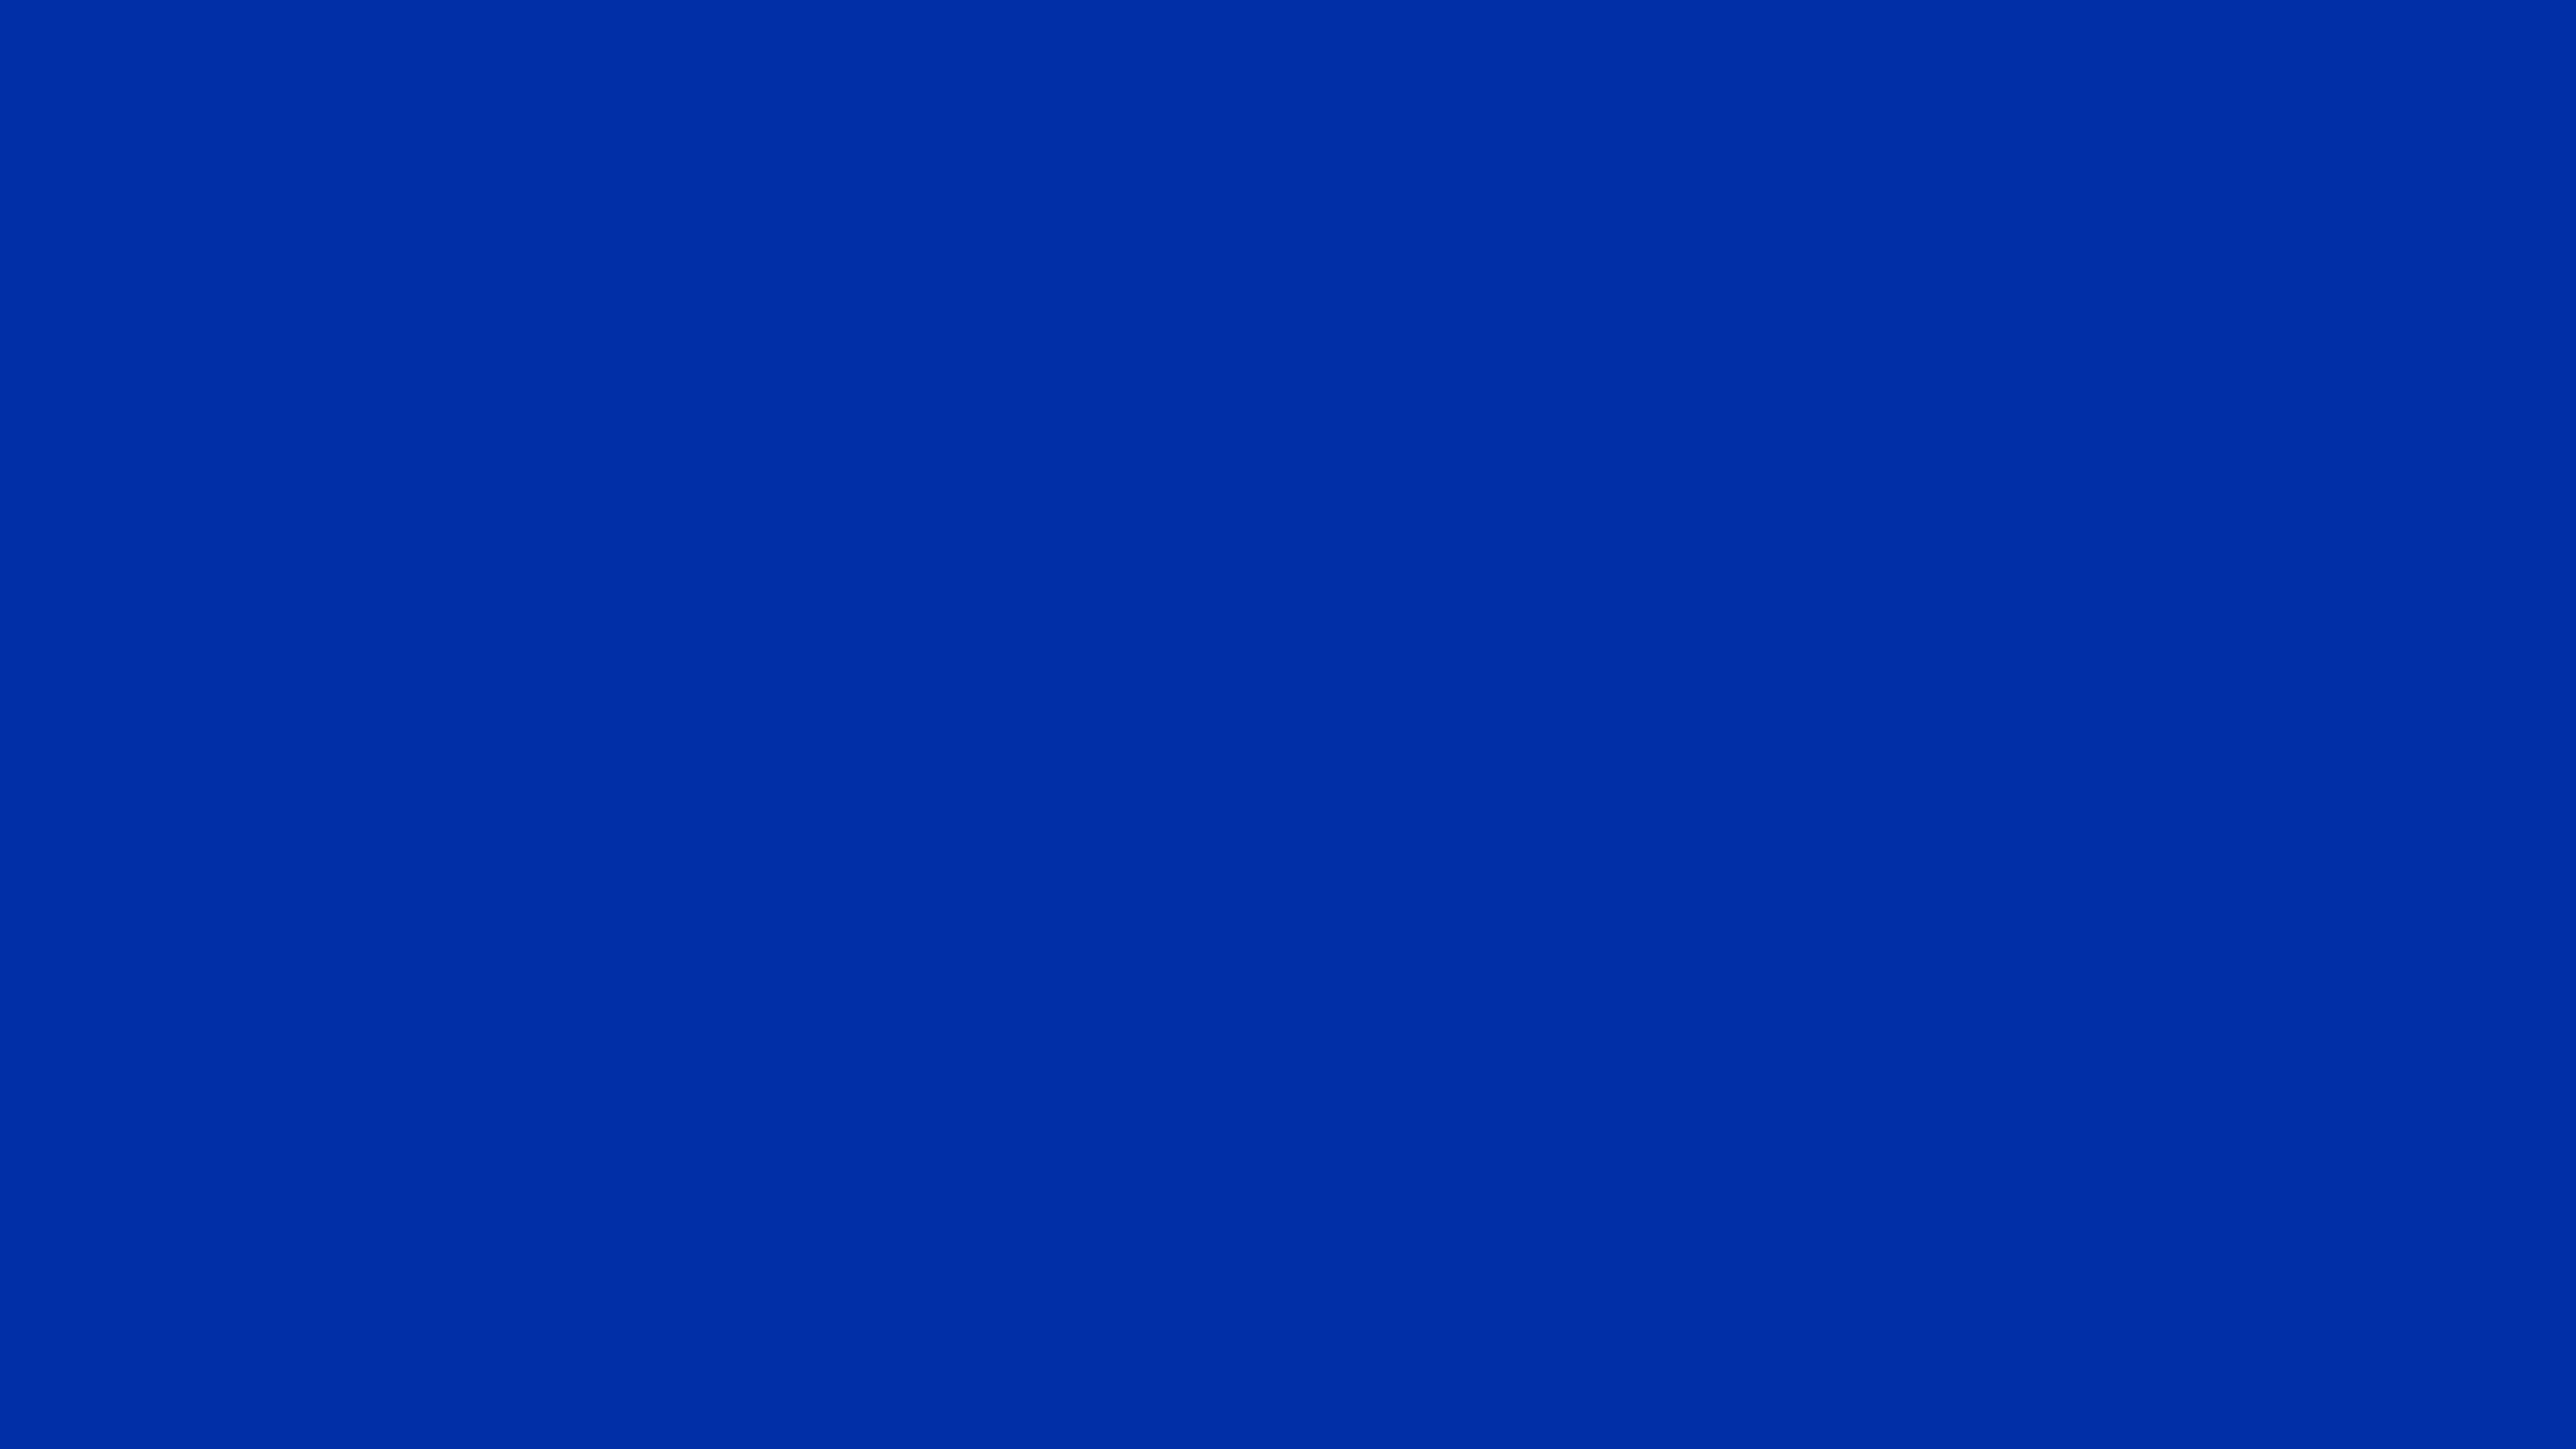 3840x2160 International Klein Blue Solid Color Background